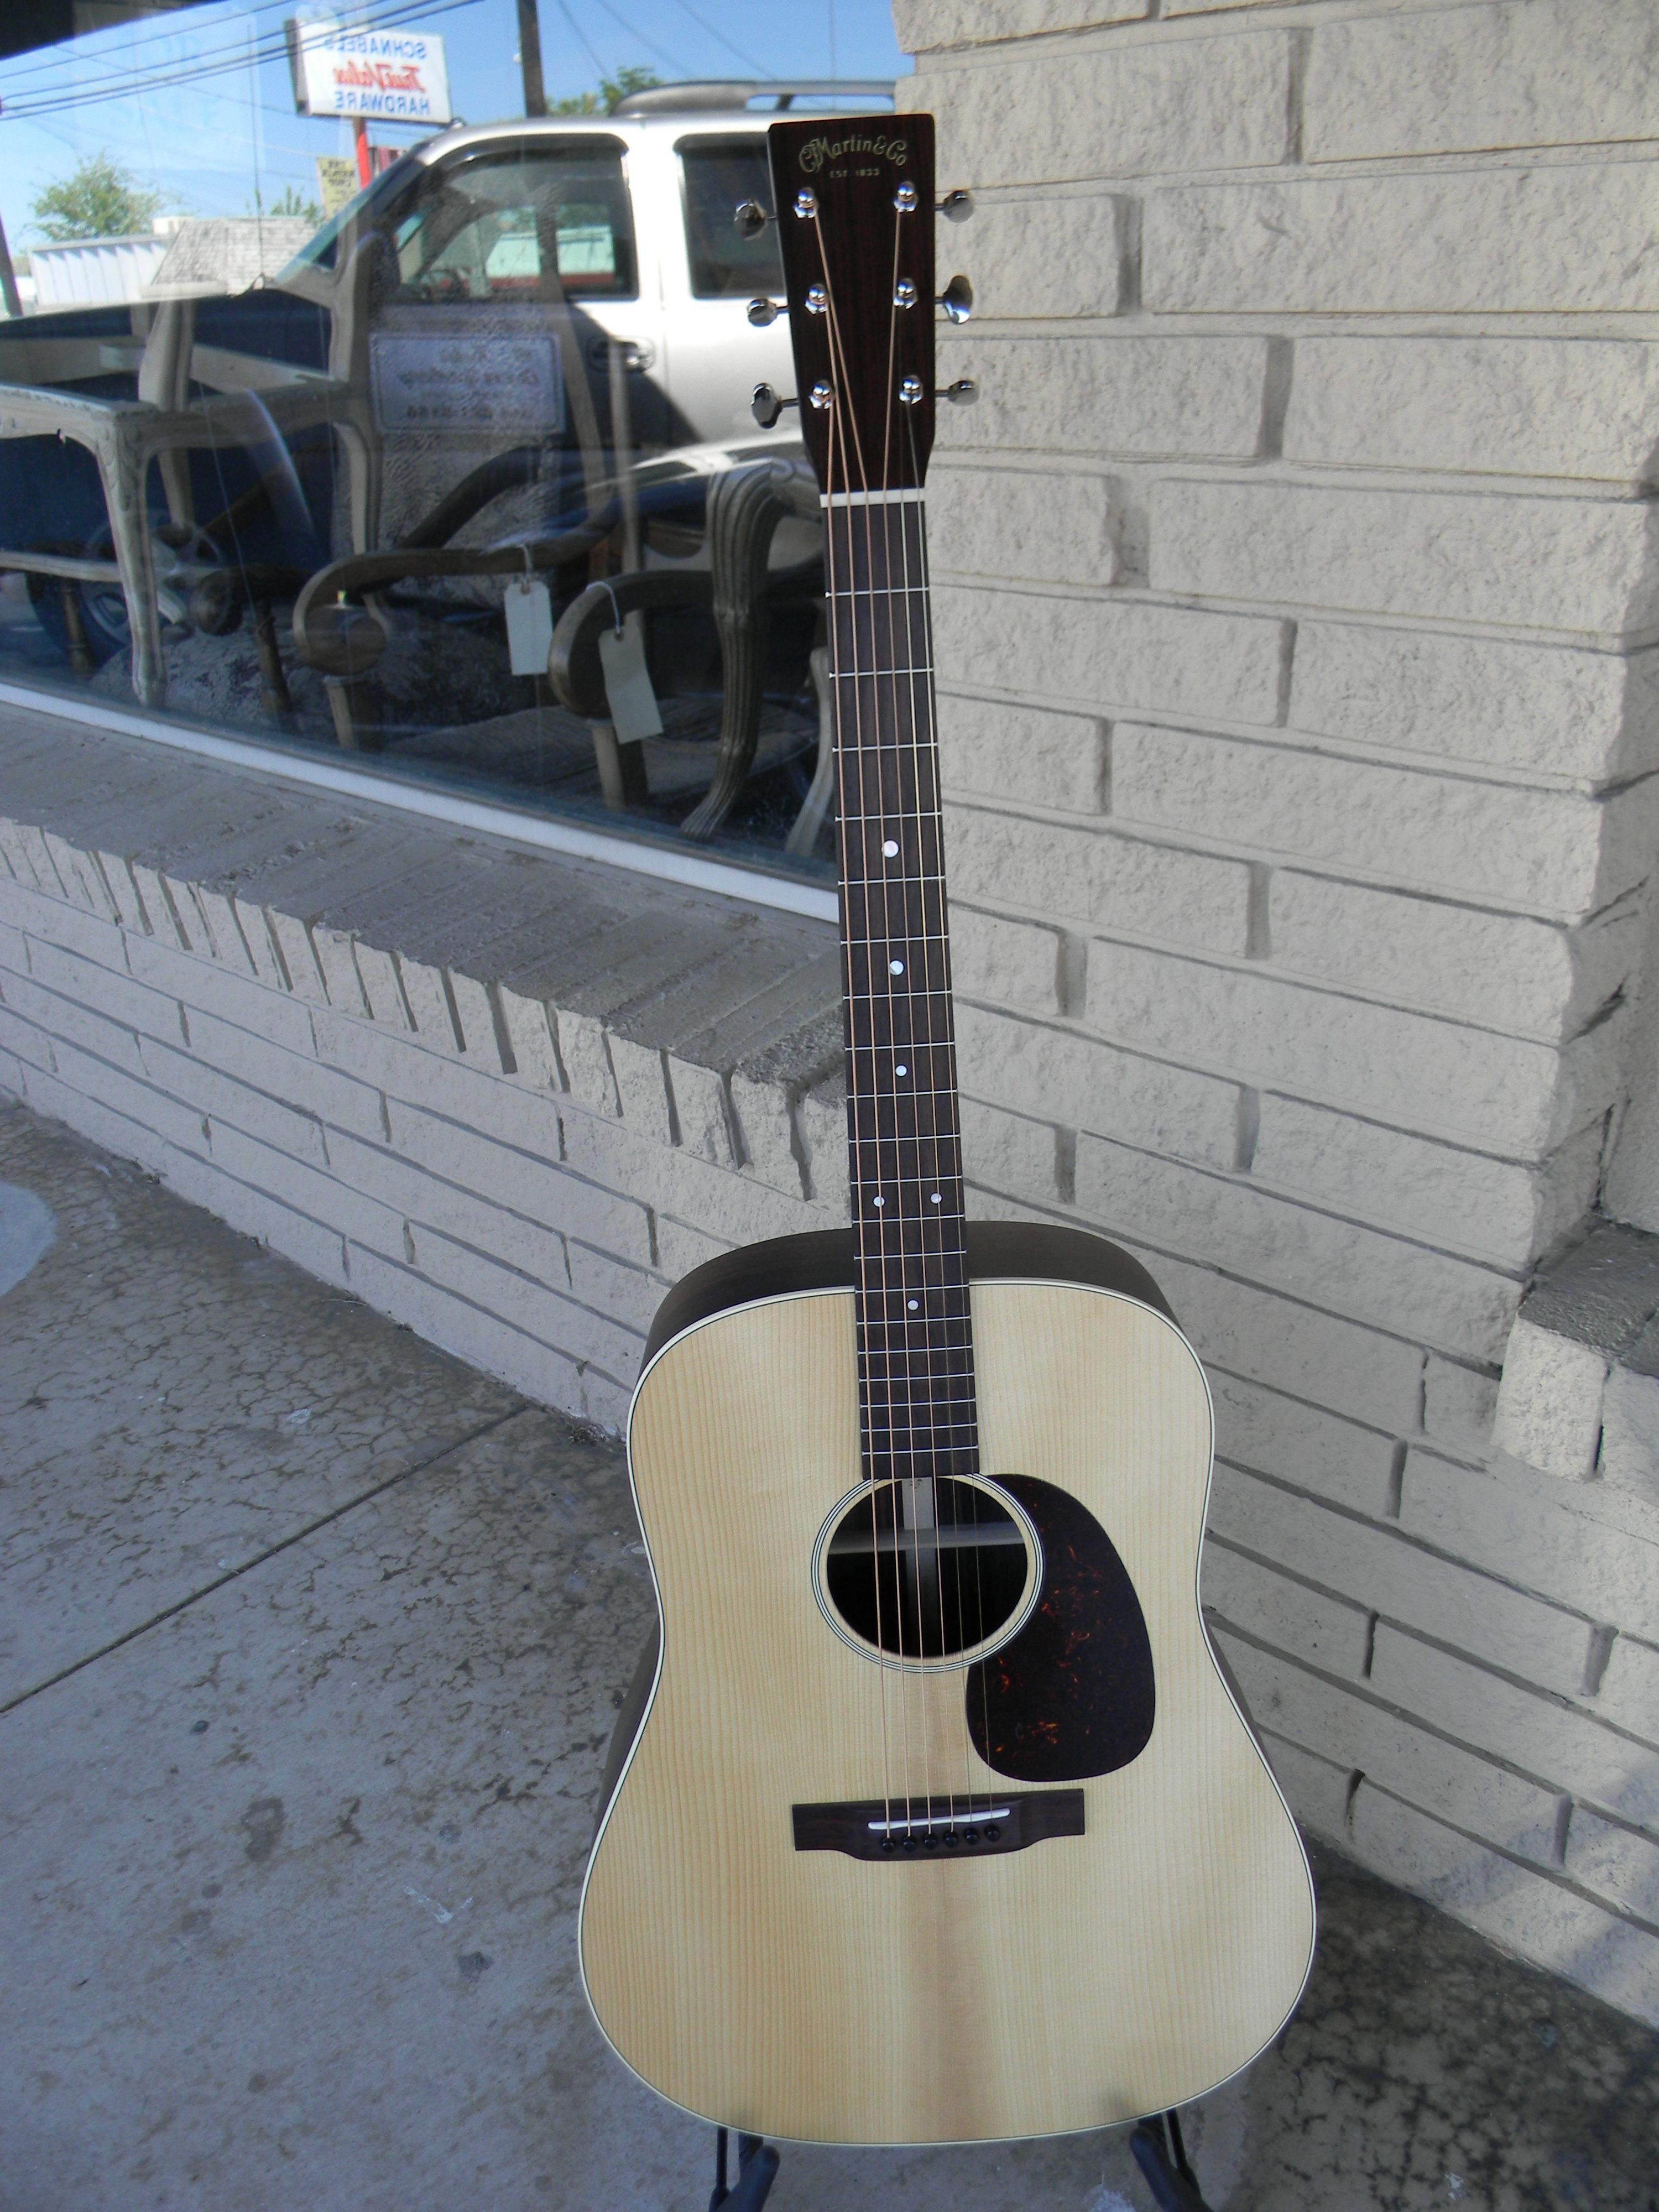 dscn7909 san antonio guitar store guitar tex. Black Bedroom Furniture Sets. Home Design Ideas